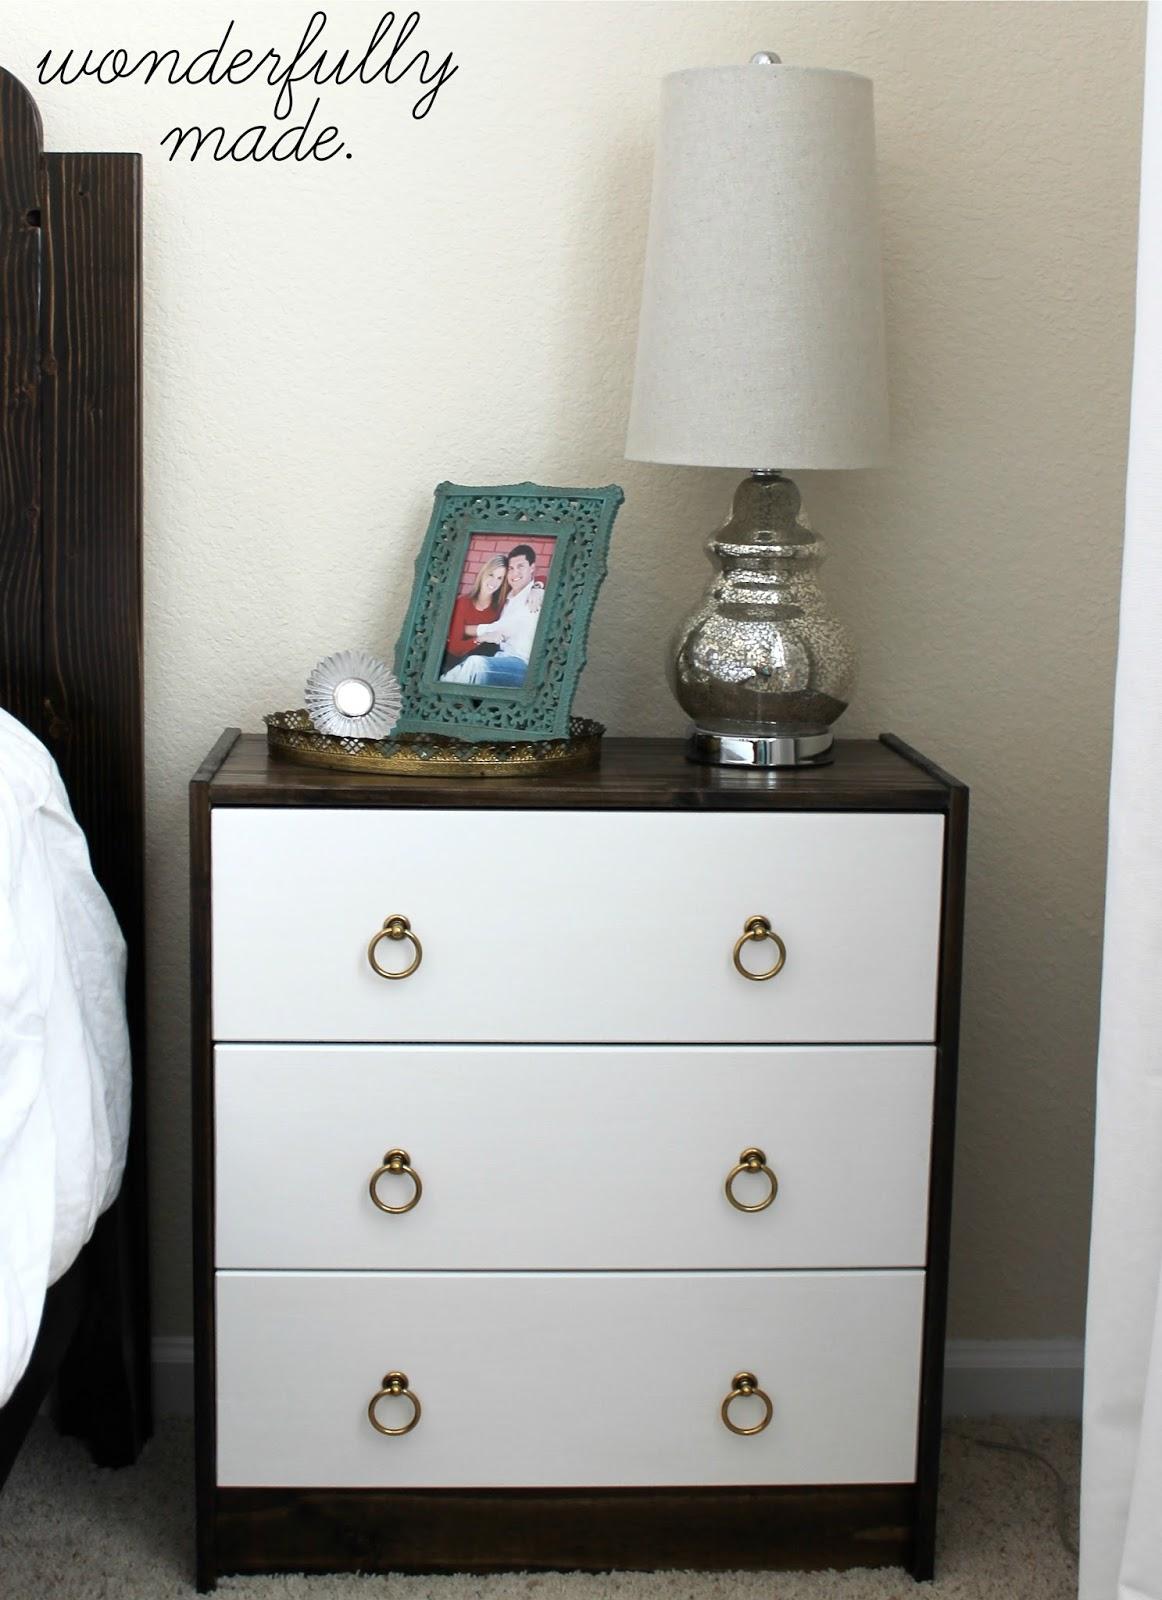 wonderfully made diy nightstands ikea rast hack. Black Bedroom Furniture Sets. Home Design Ideas